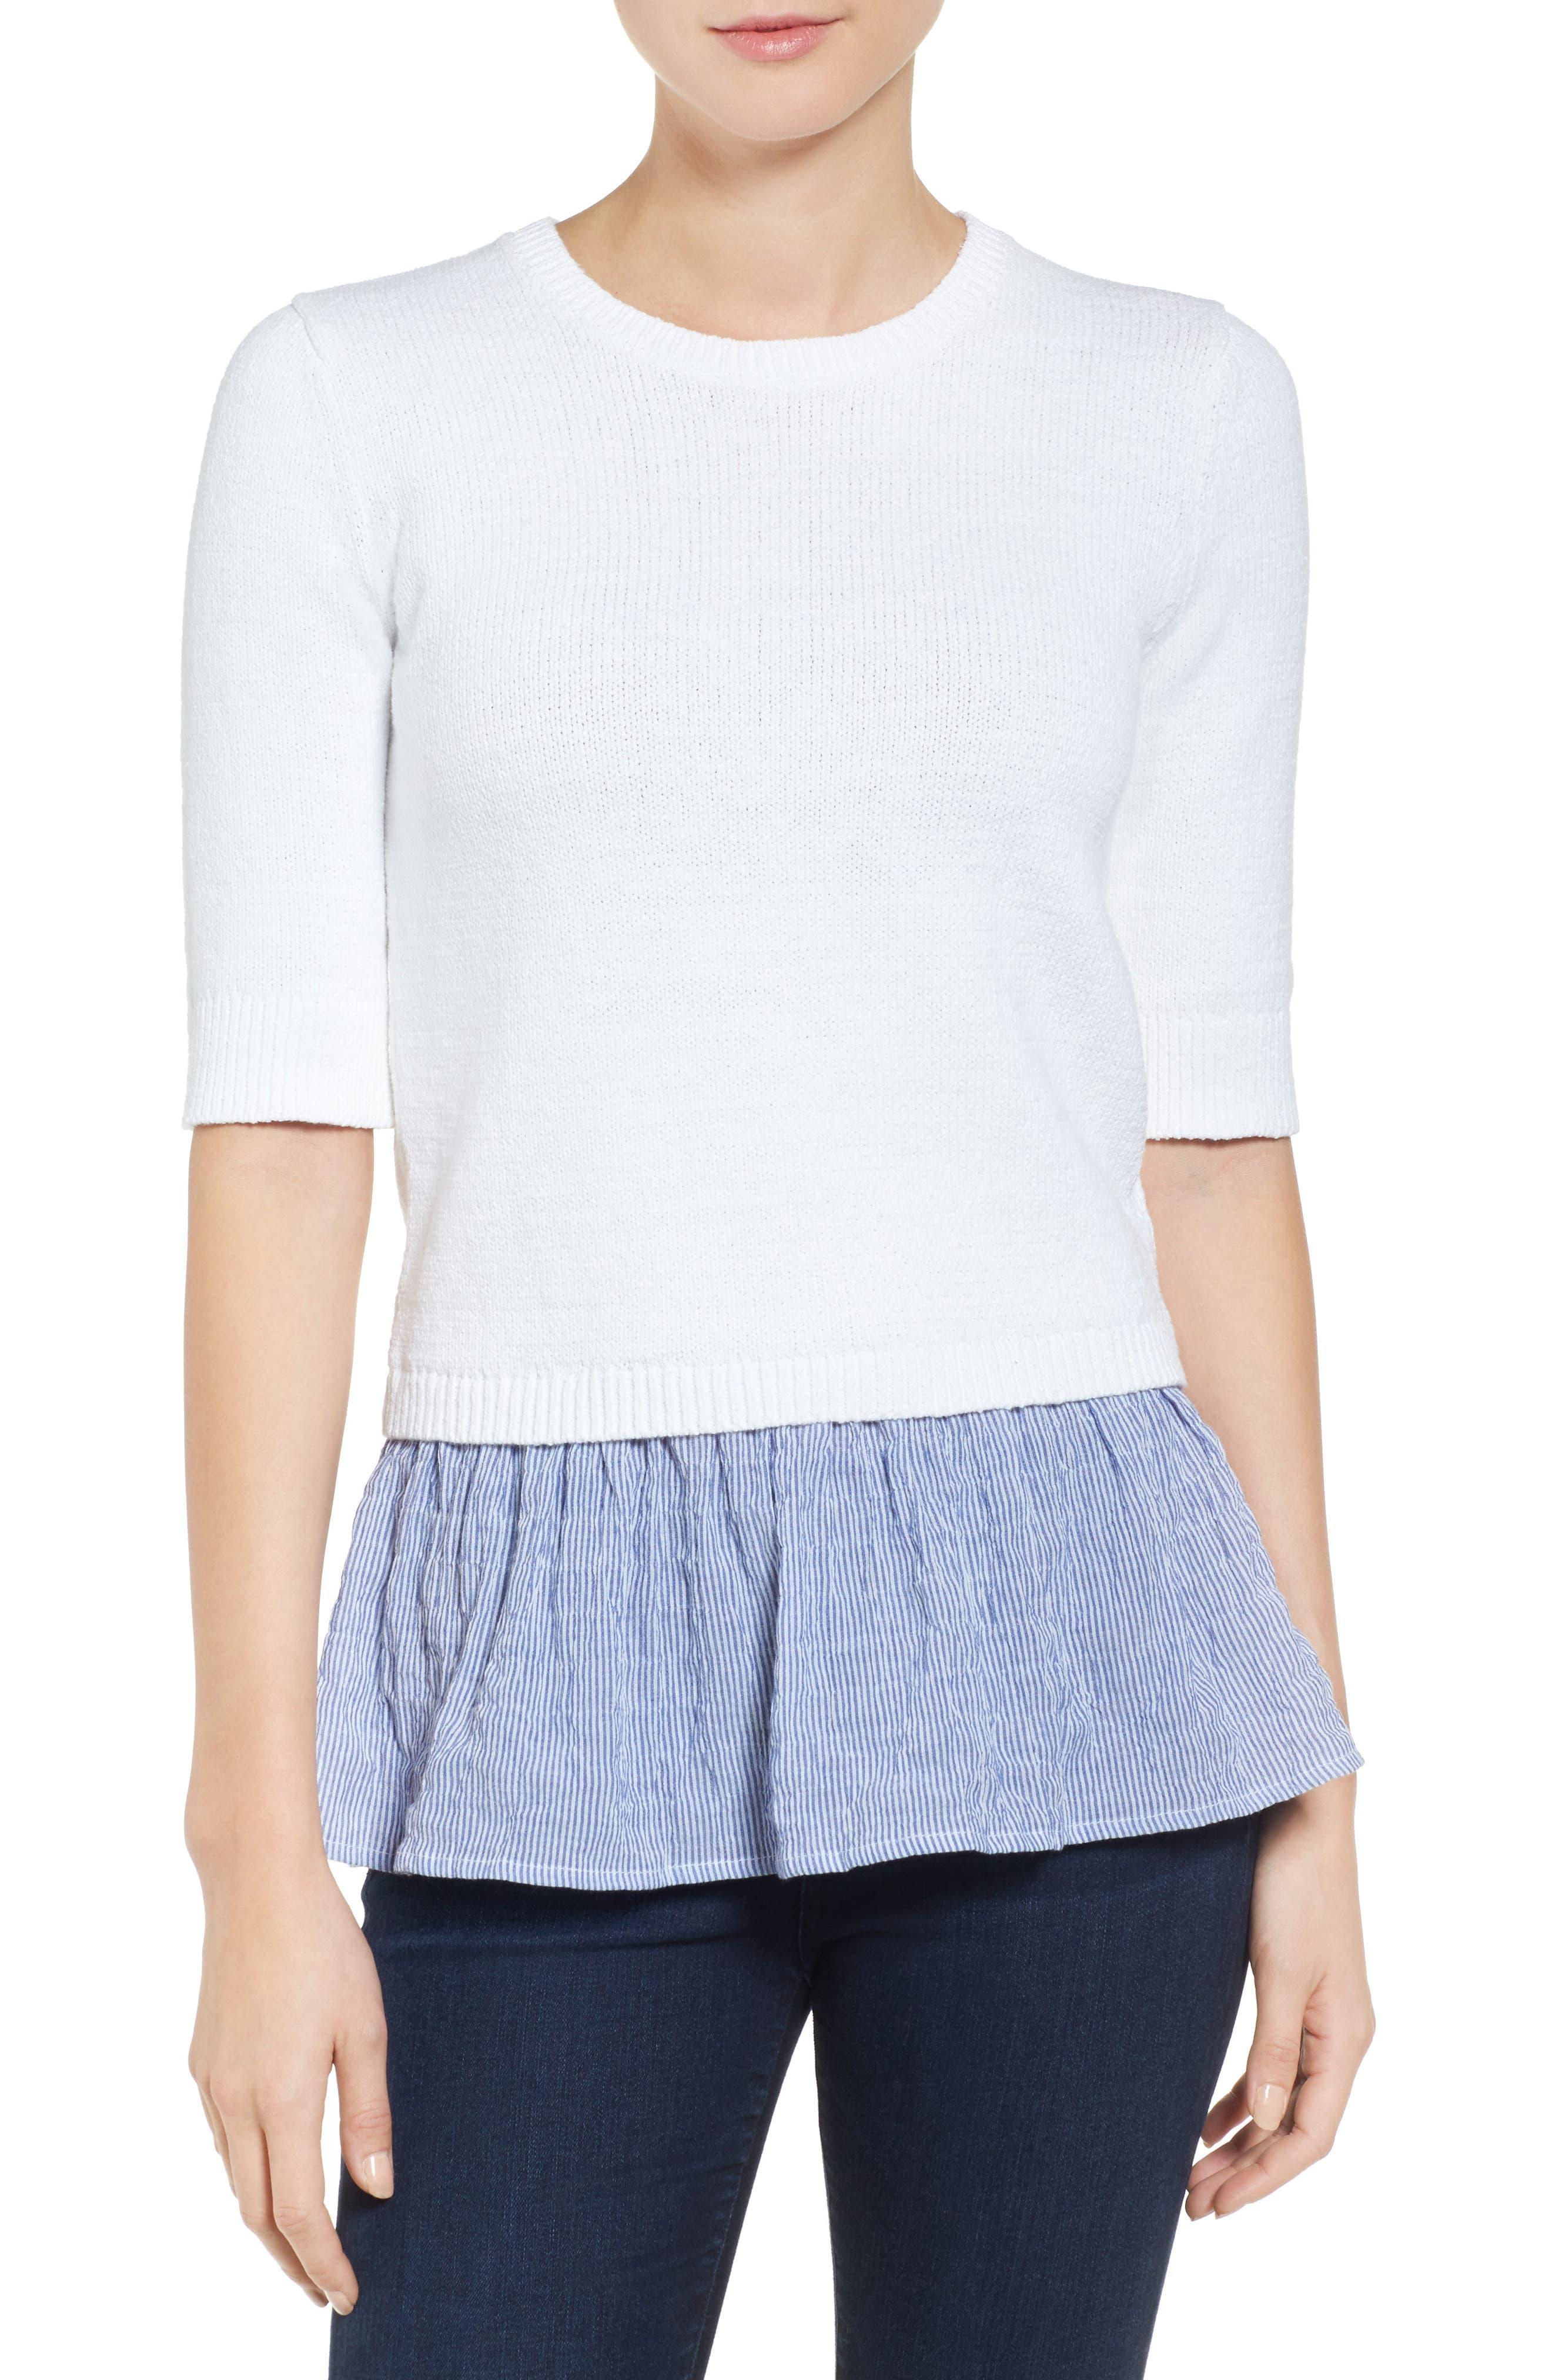 Alternate Image 1 Selected - MICHAEL Michael Kors Contrast Hem Cotton Blend Sweater